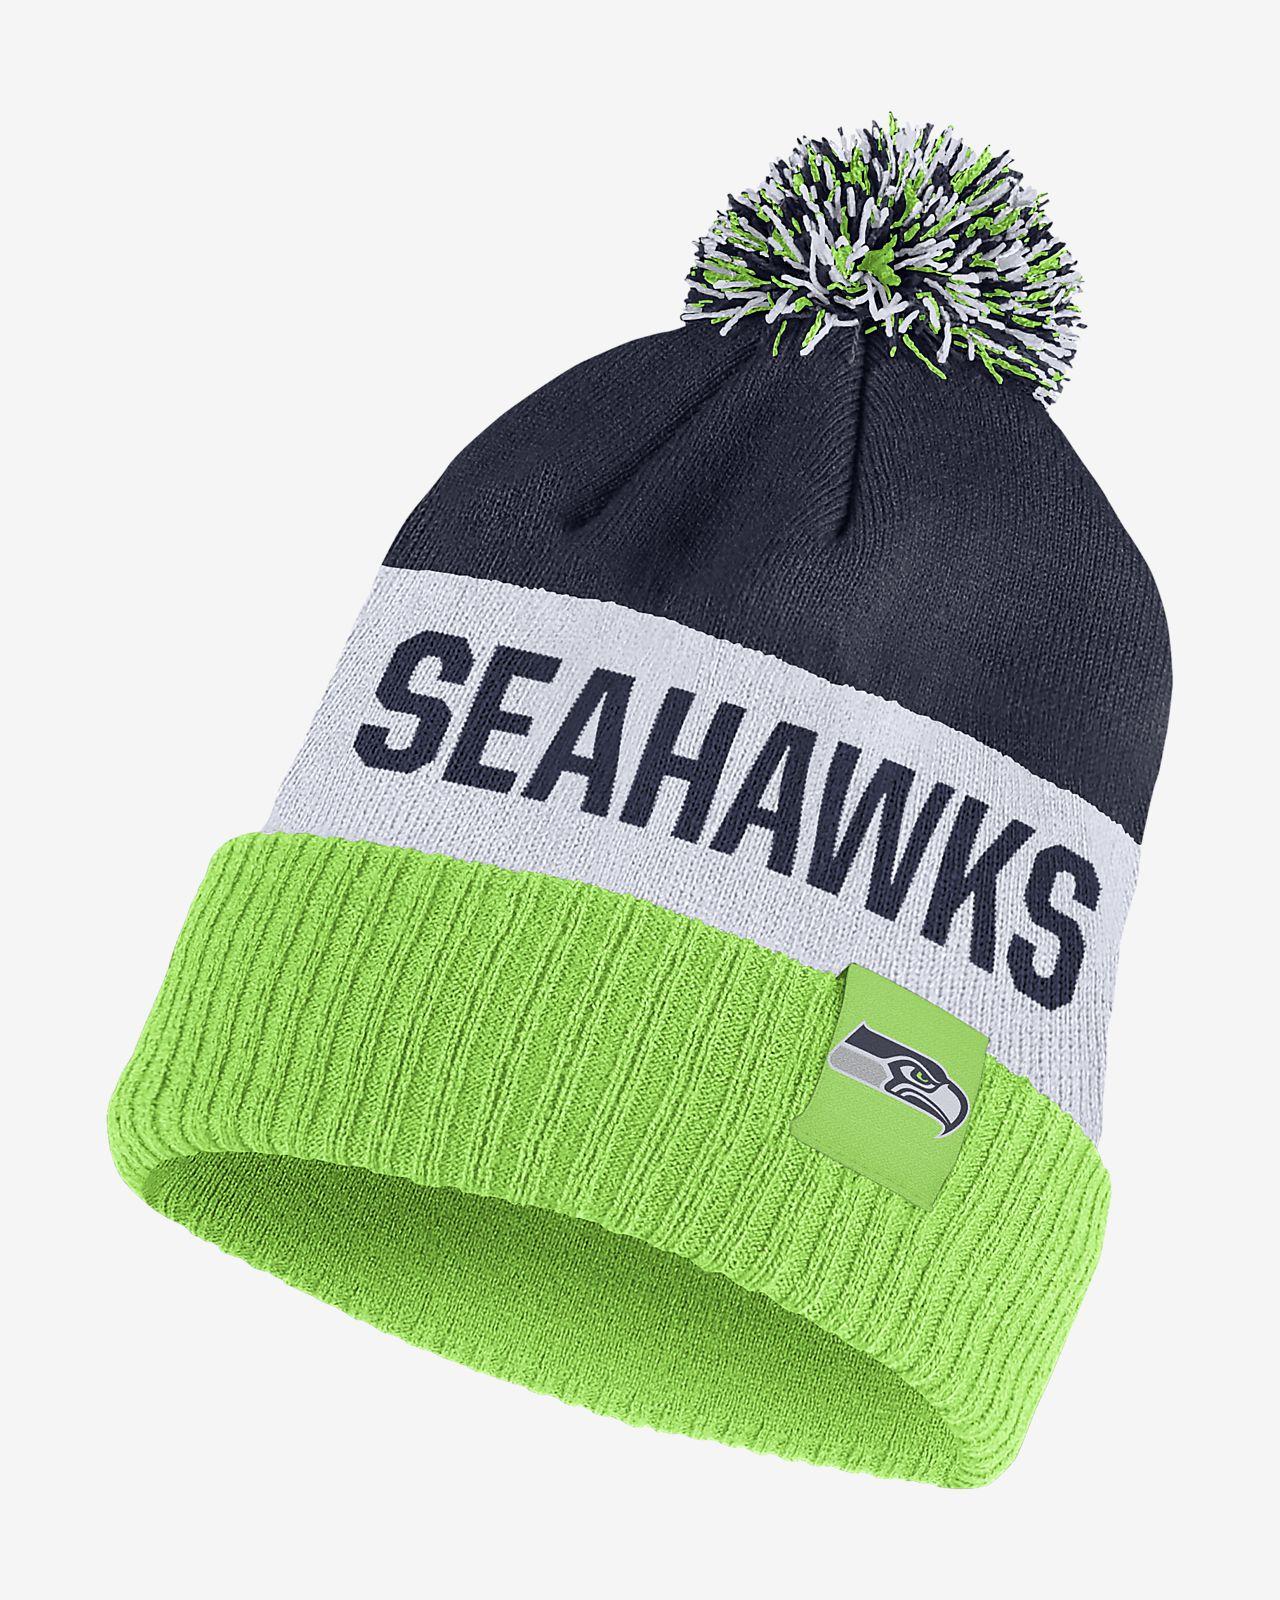 Nike (NFL Seahawks) Gorra